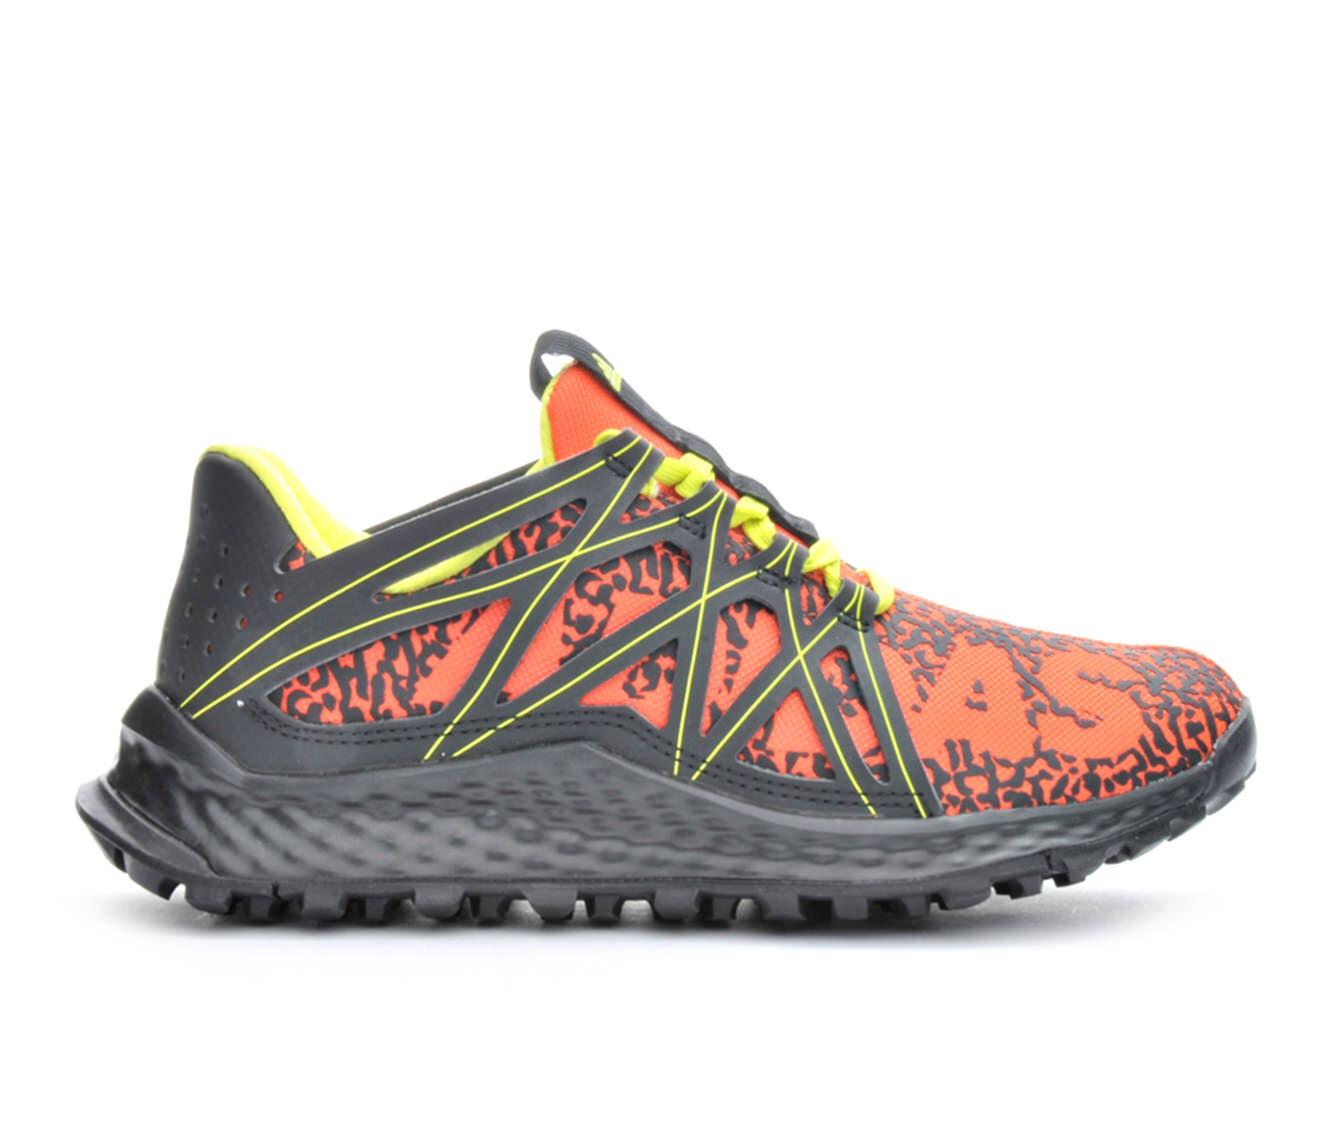 Boys' Adidas Vigor Bounce C 10.5-3 Running Shoes